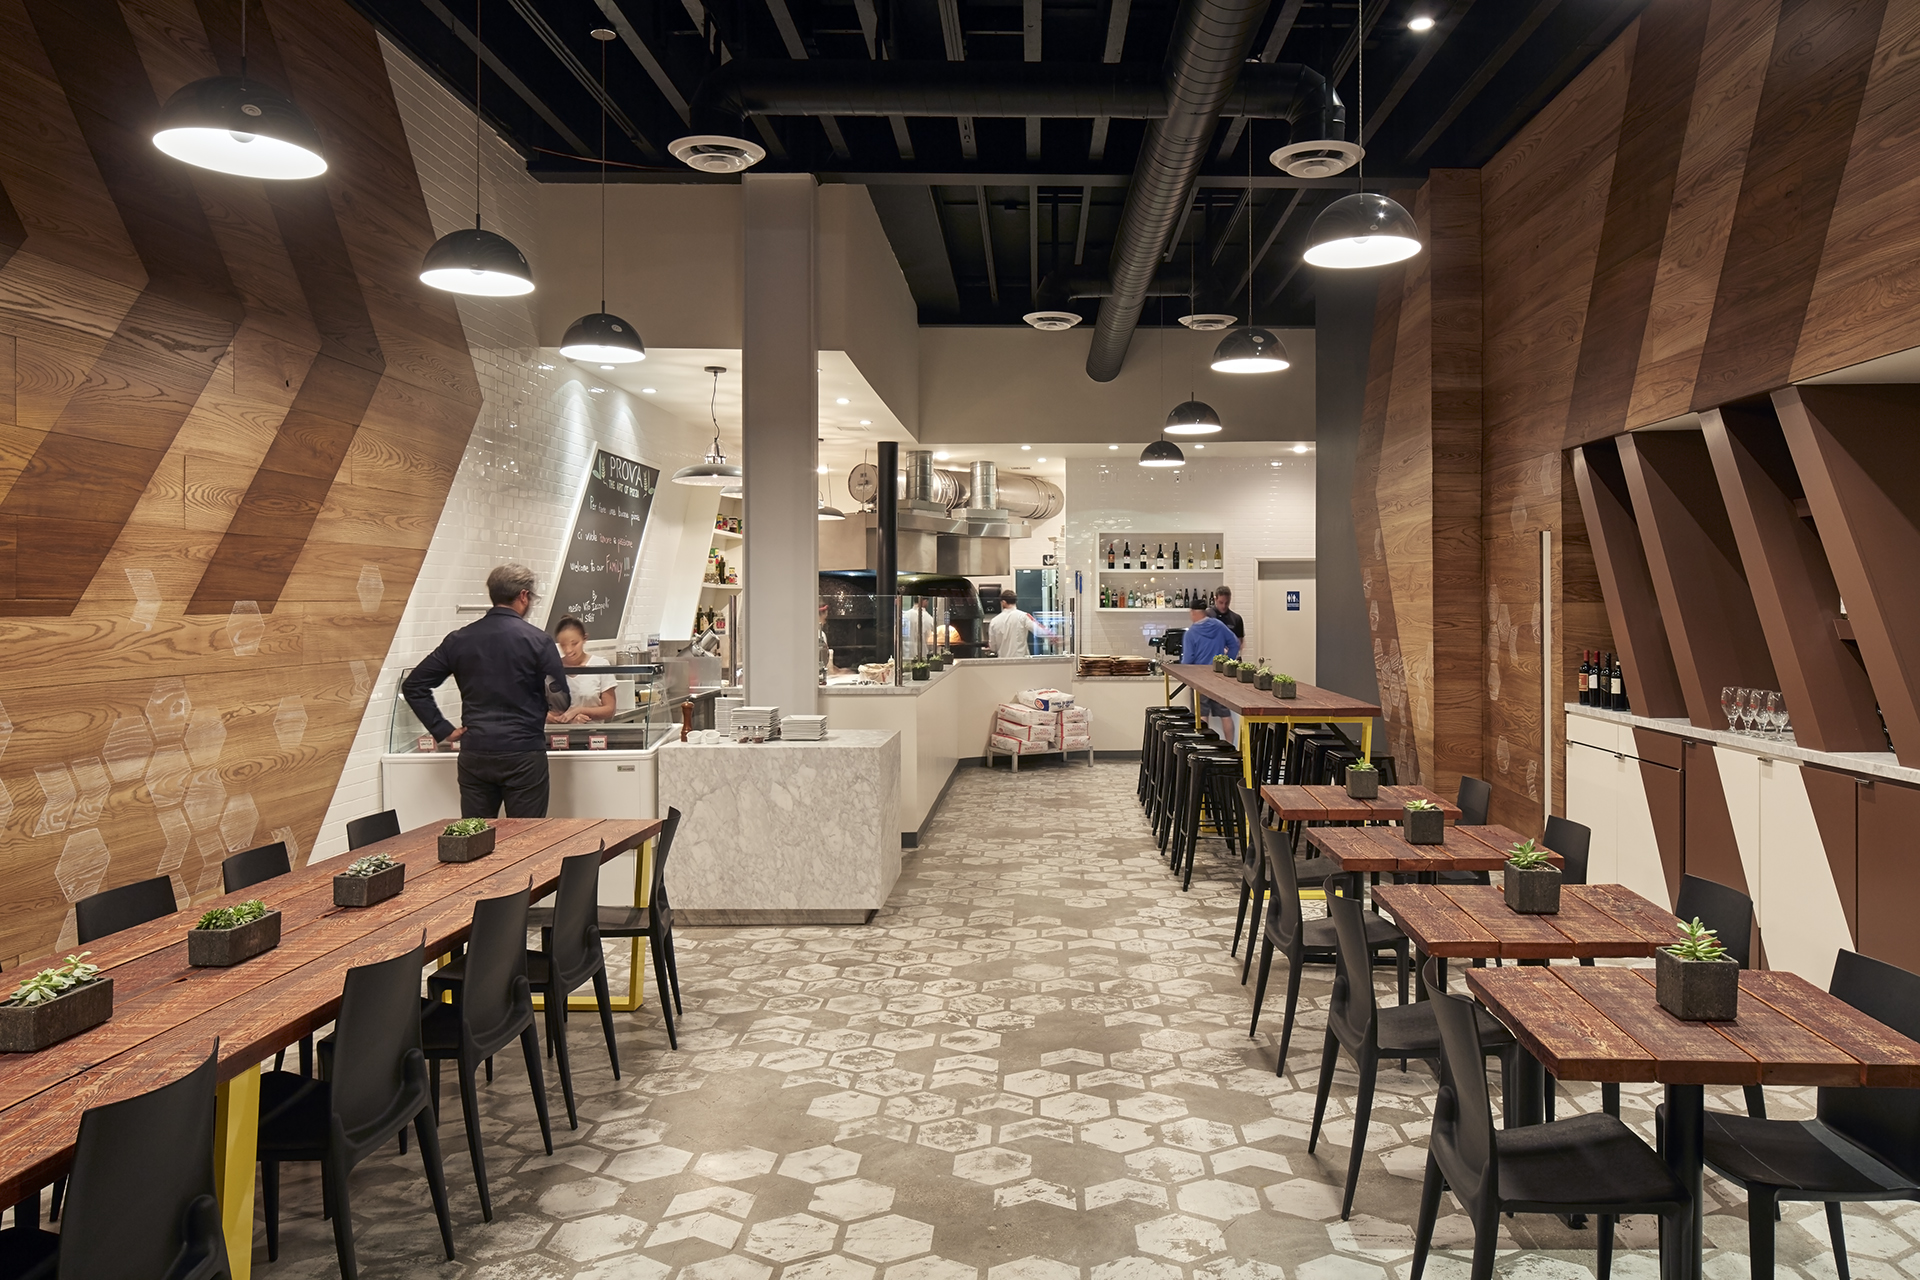 belzberg-architects-Prova-Pizzeria-110.jpg